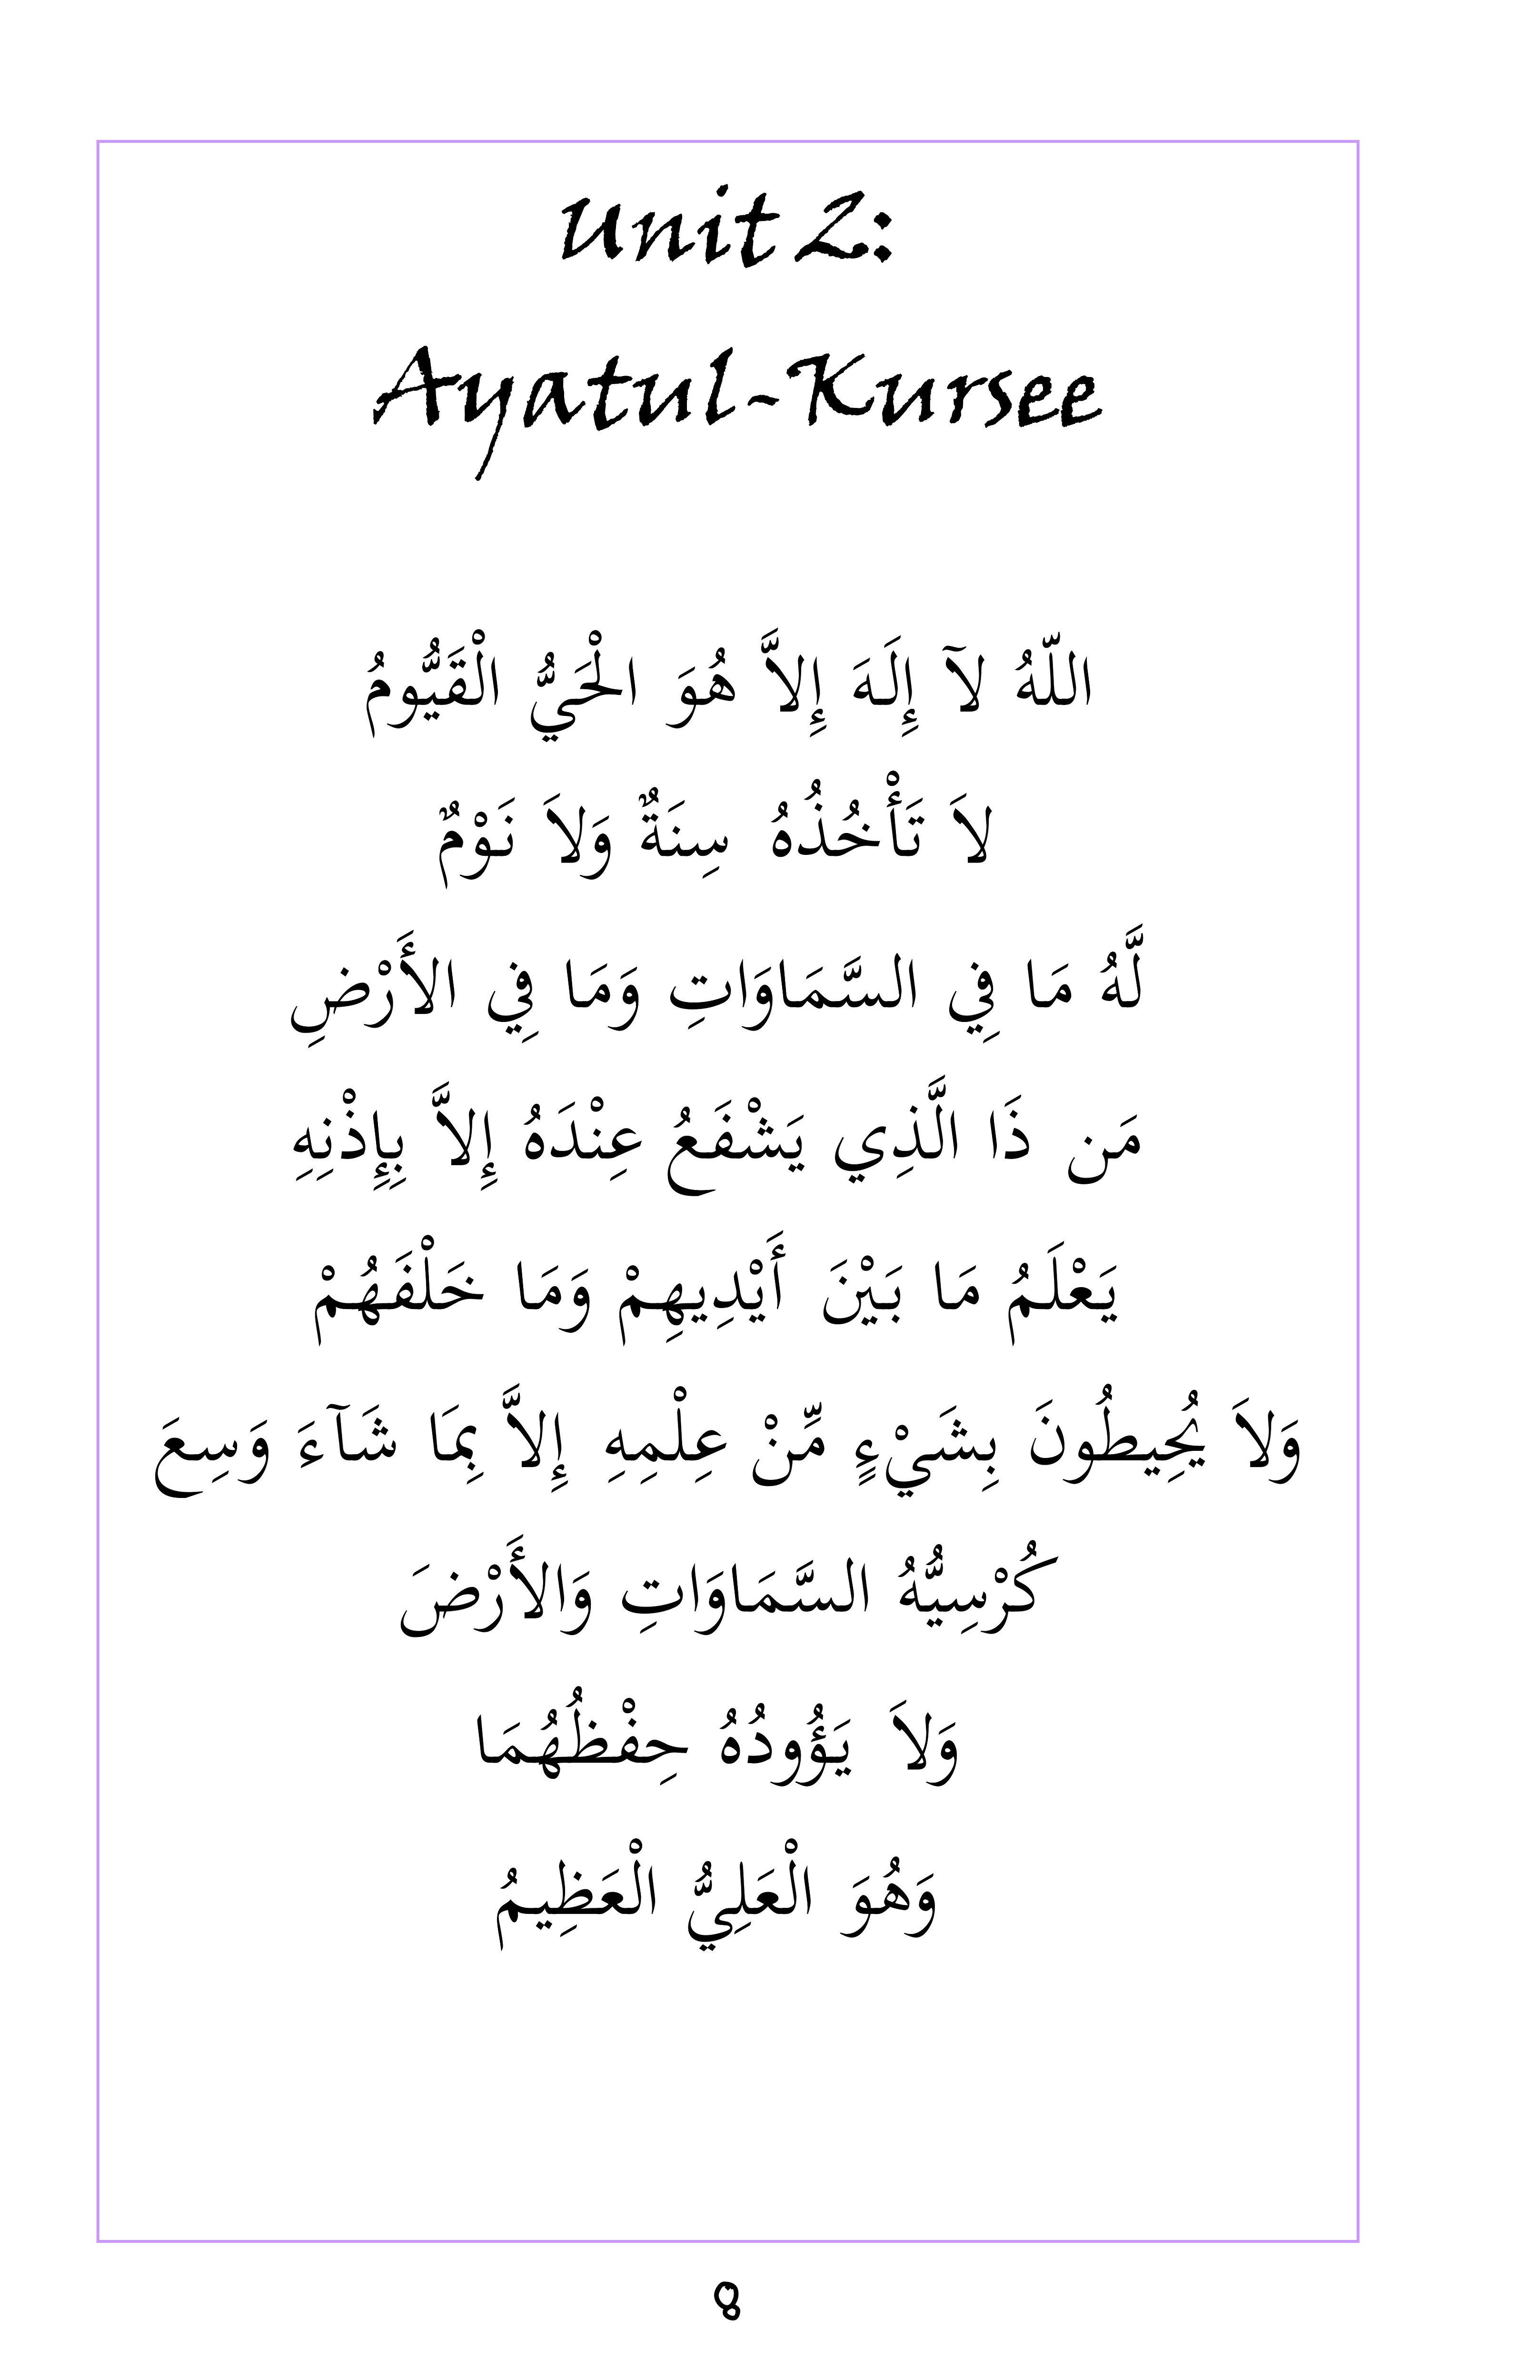 Level A Islamic Studies & Arabic Course: KG-1st Grade